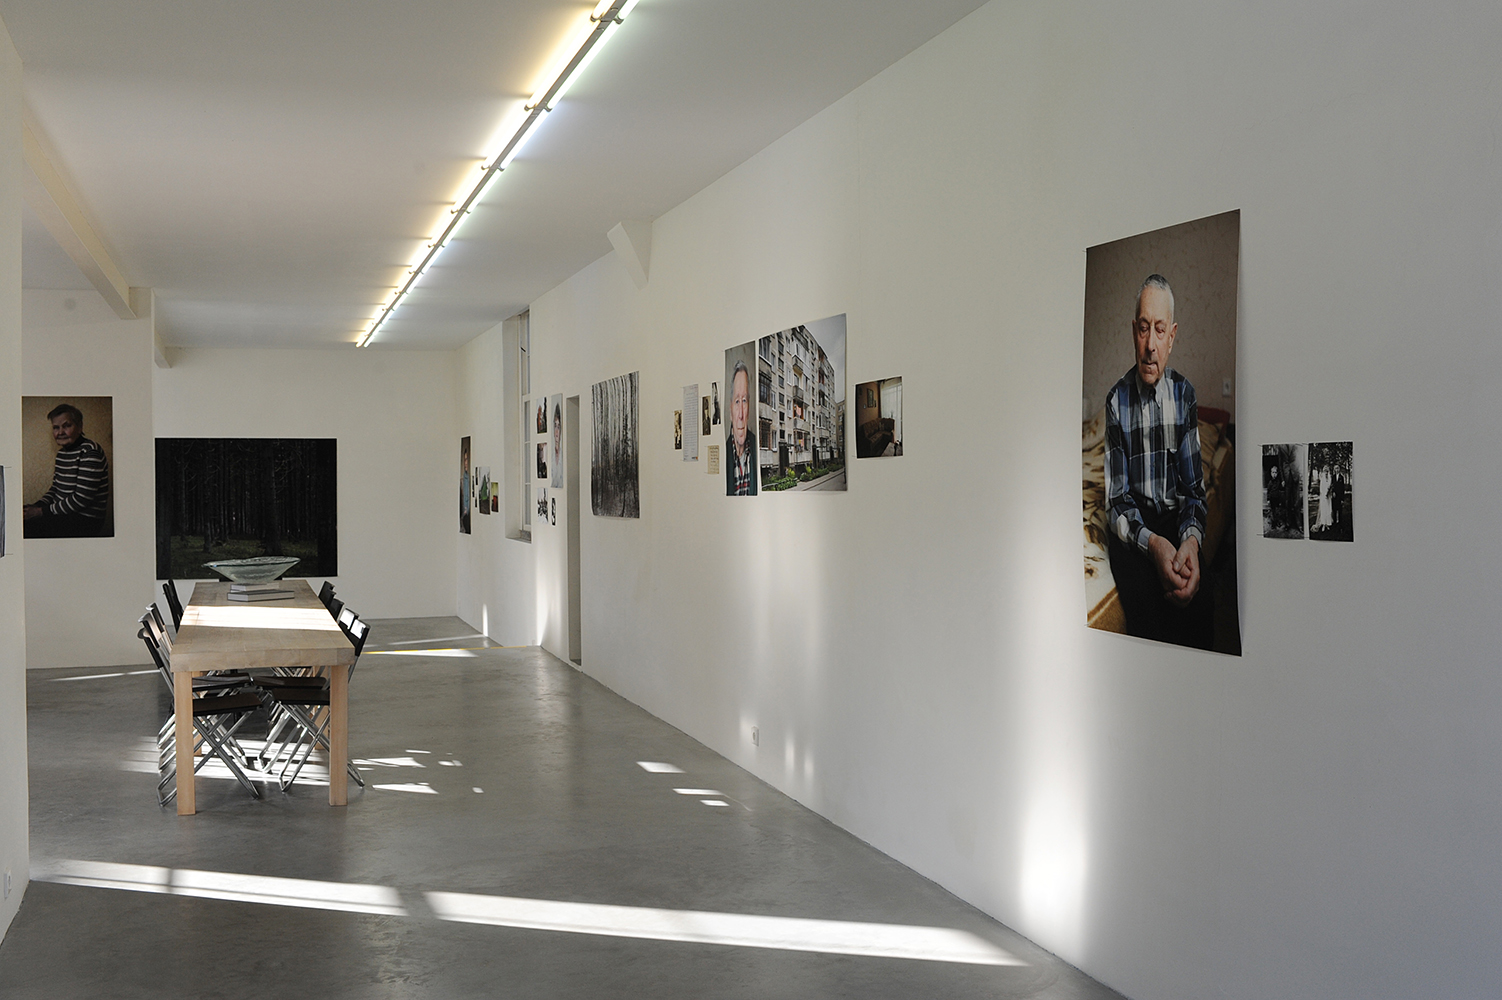 web-galerie-ecker-03